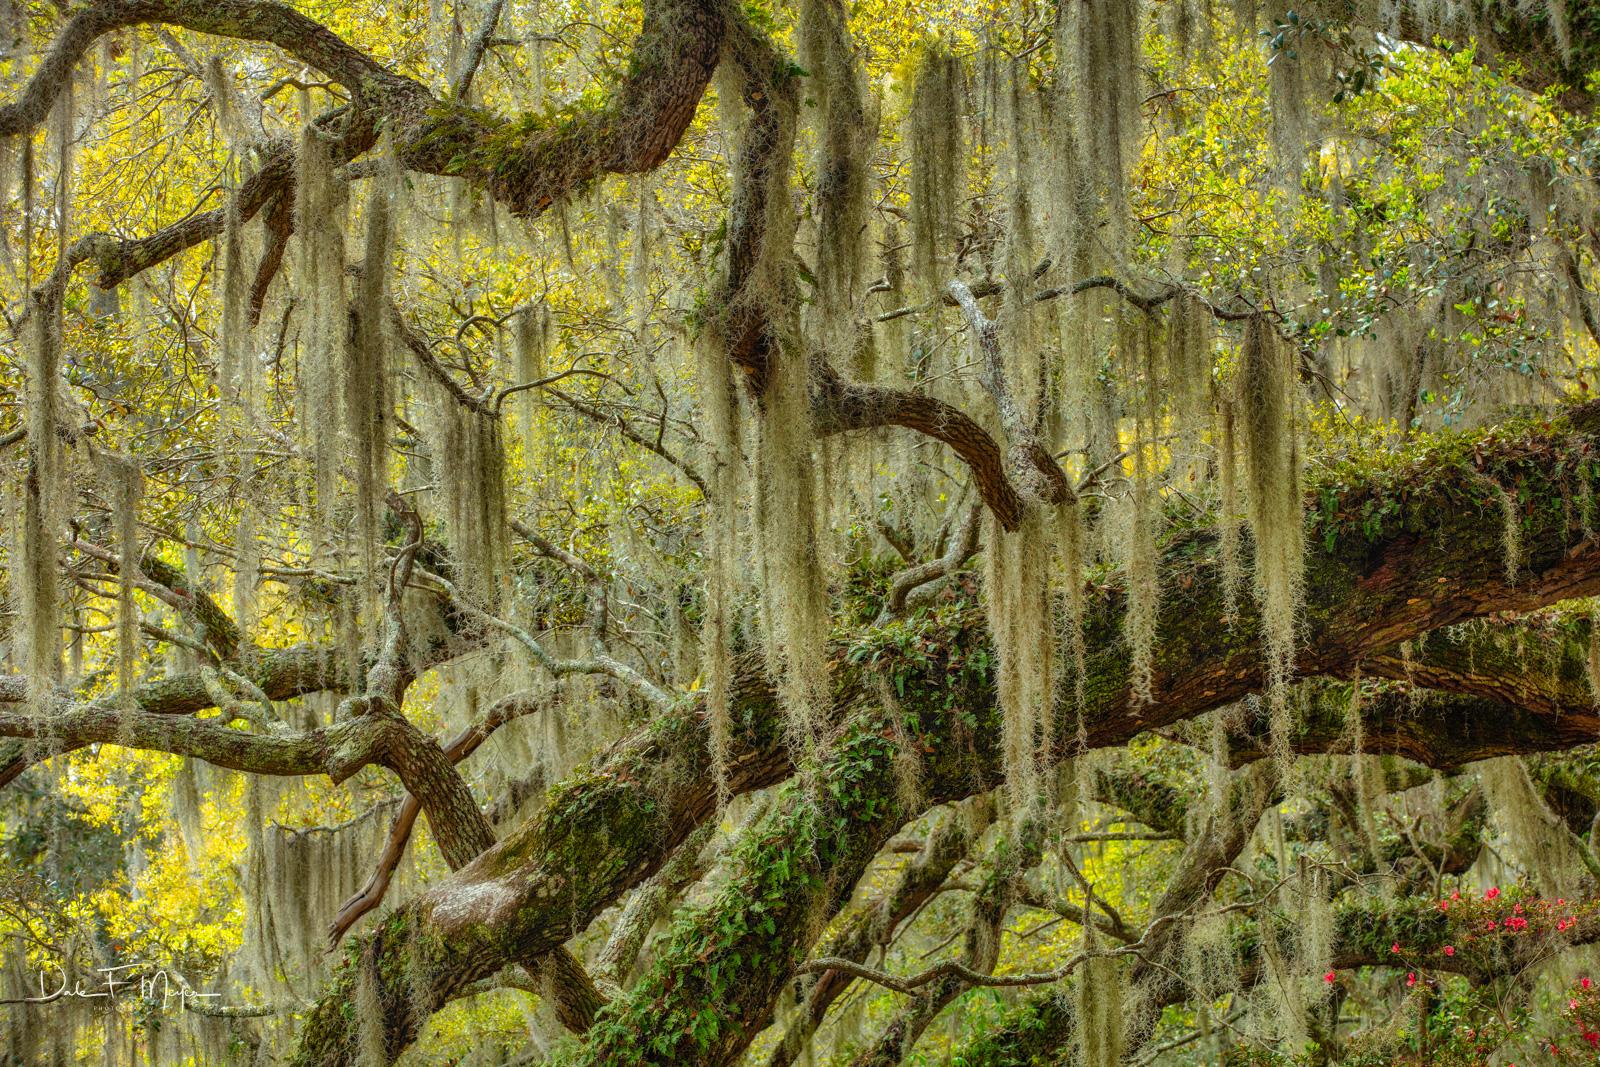 Live Oak Tree Limbs and Spanish Moss, Magnolia Plantation South Carolina, photo